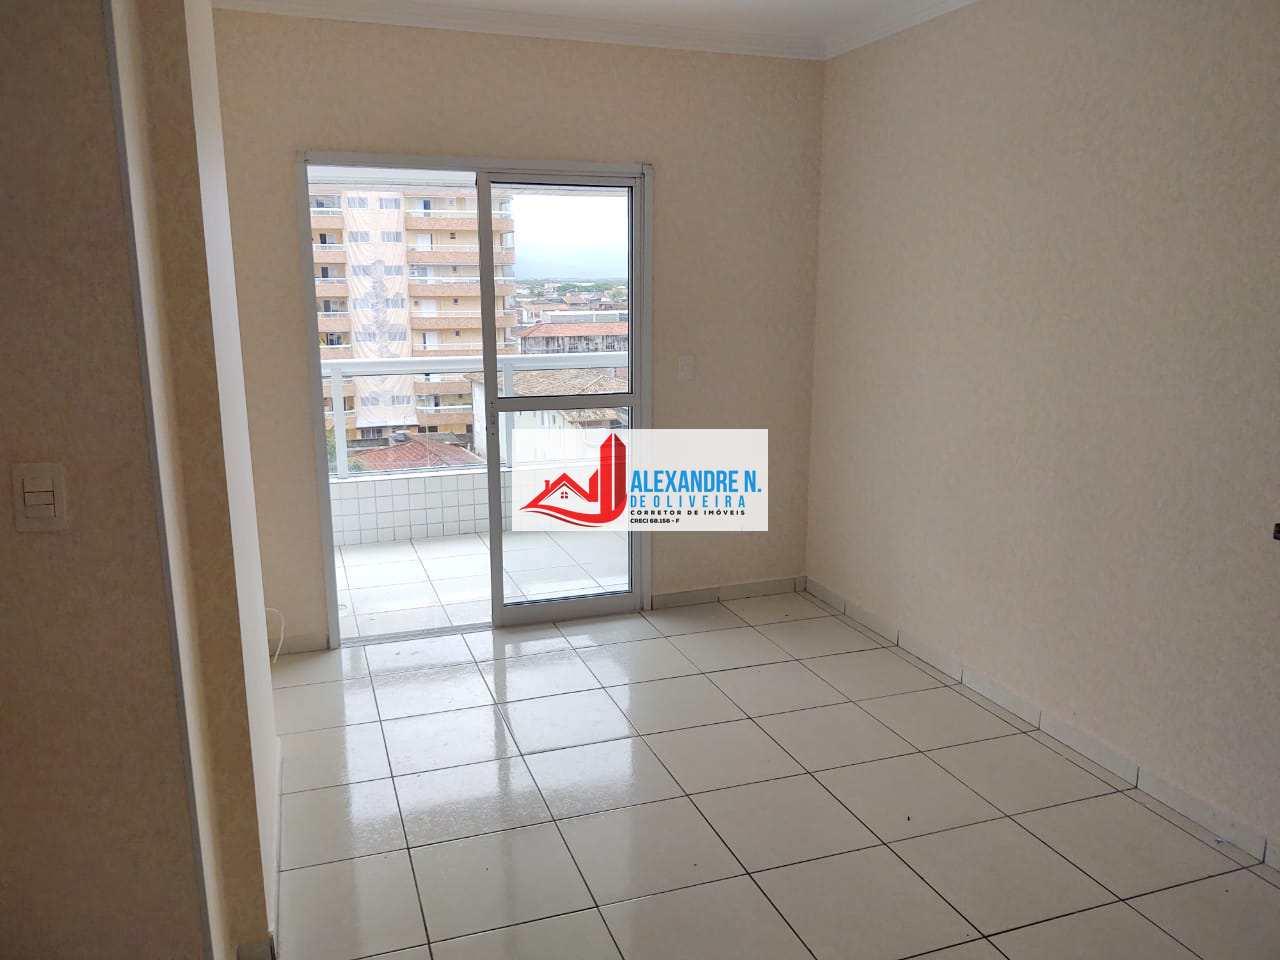 Apto 2 dorms, Tupi, Praia Grande, Entr. R$ 100 mil, AP00719